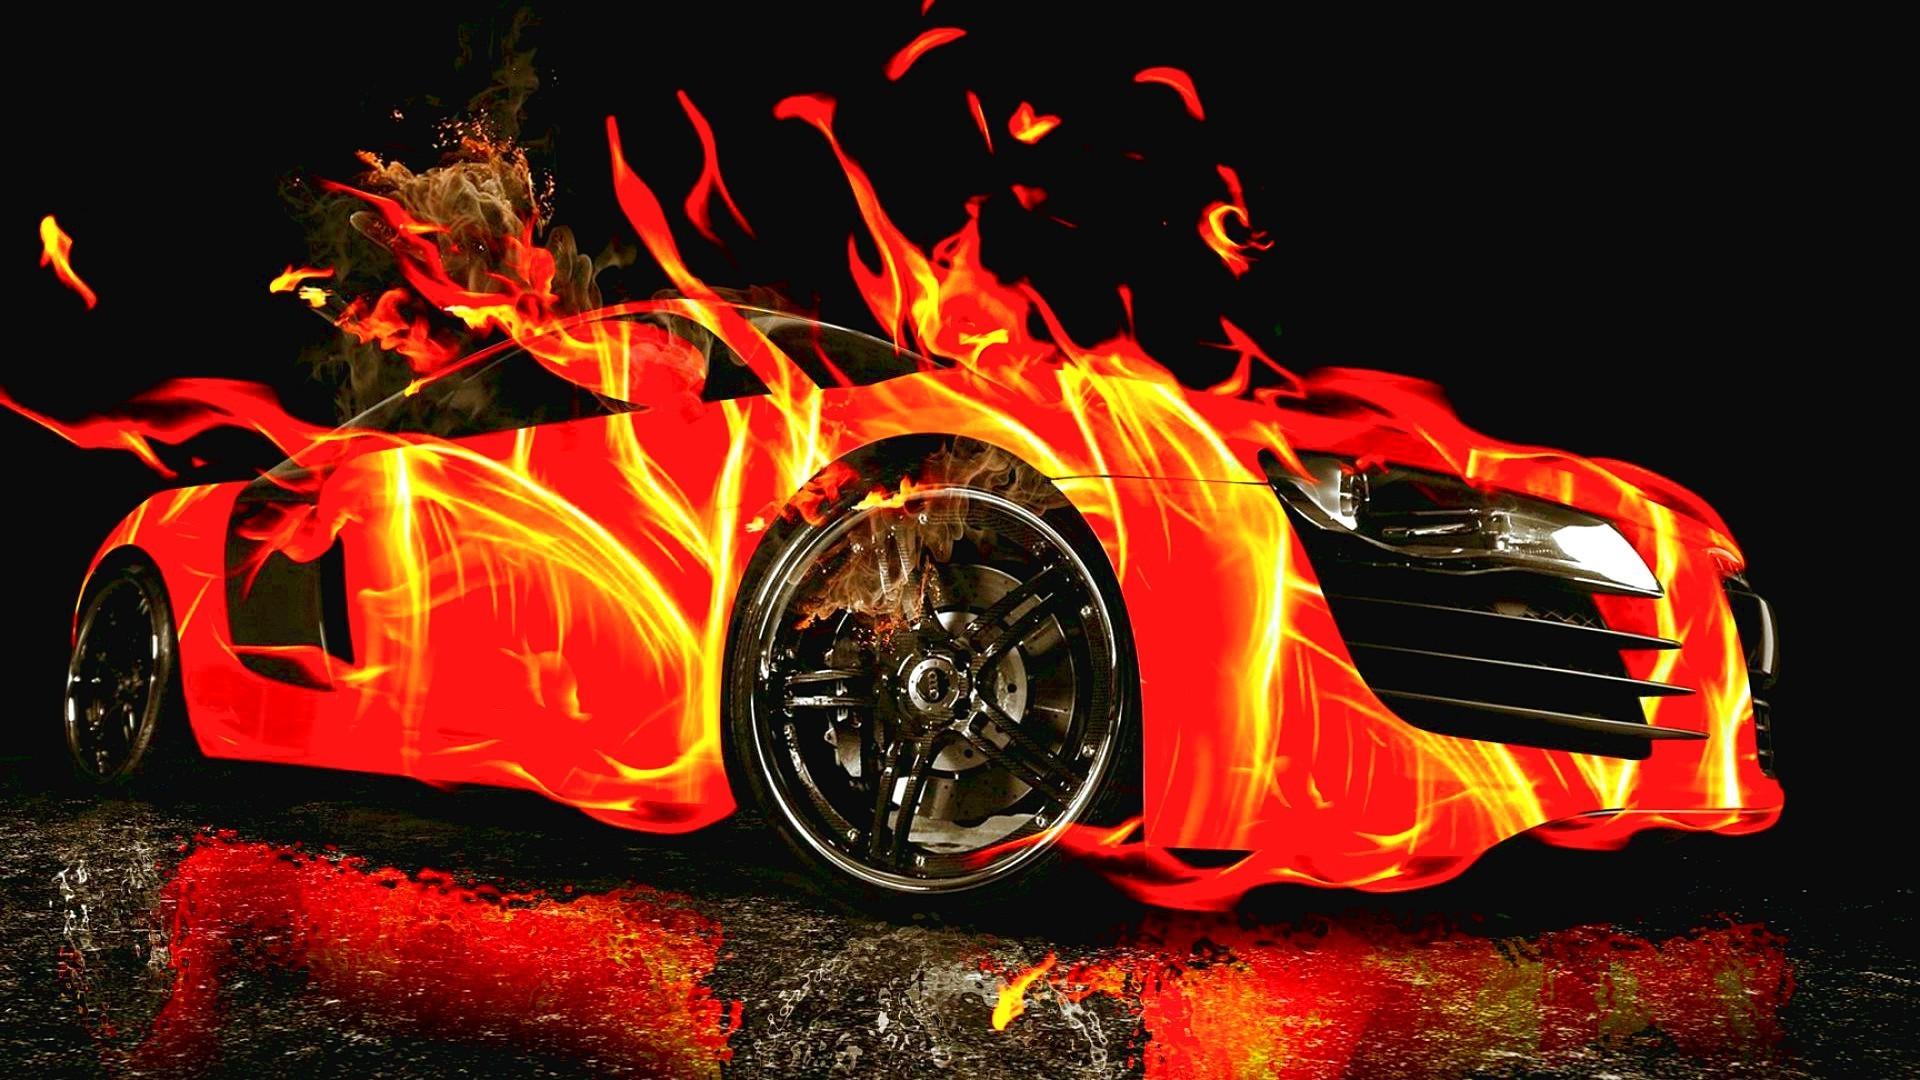 Neon Car Wallpaper 89 Images